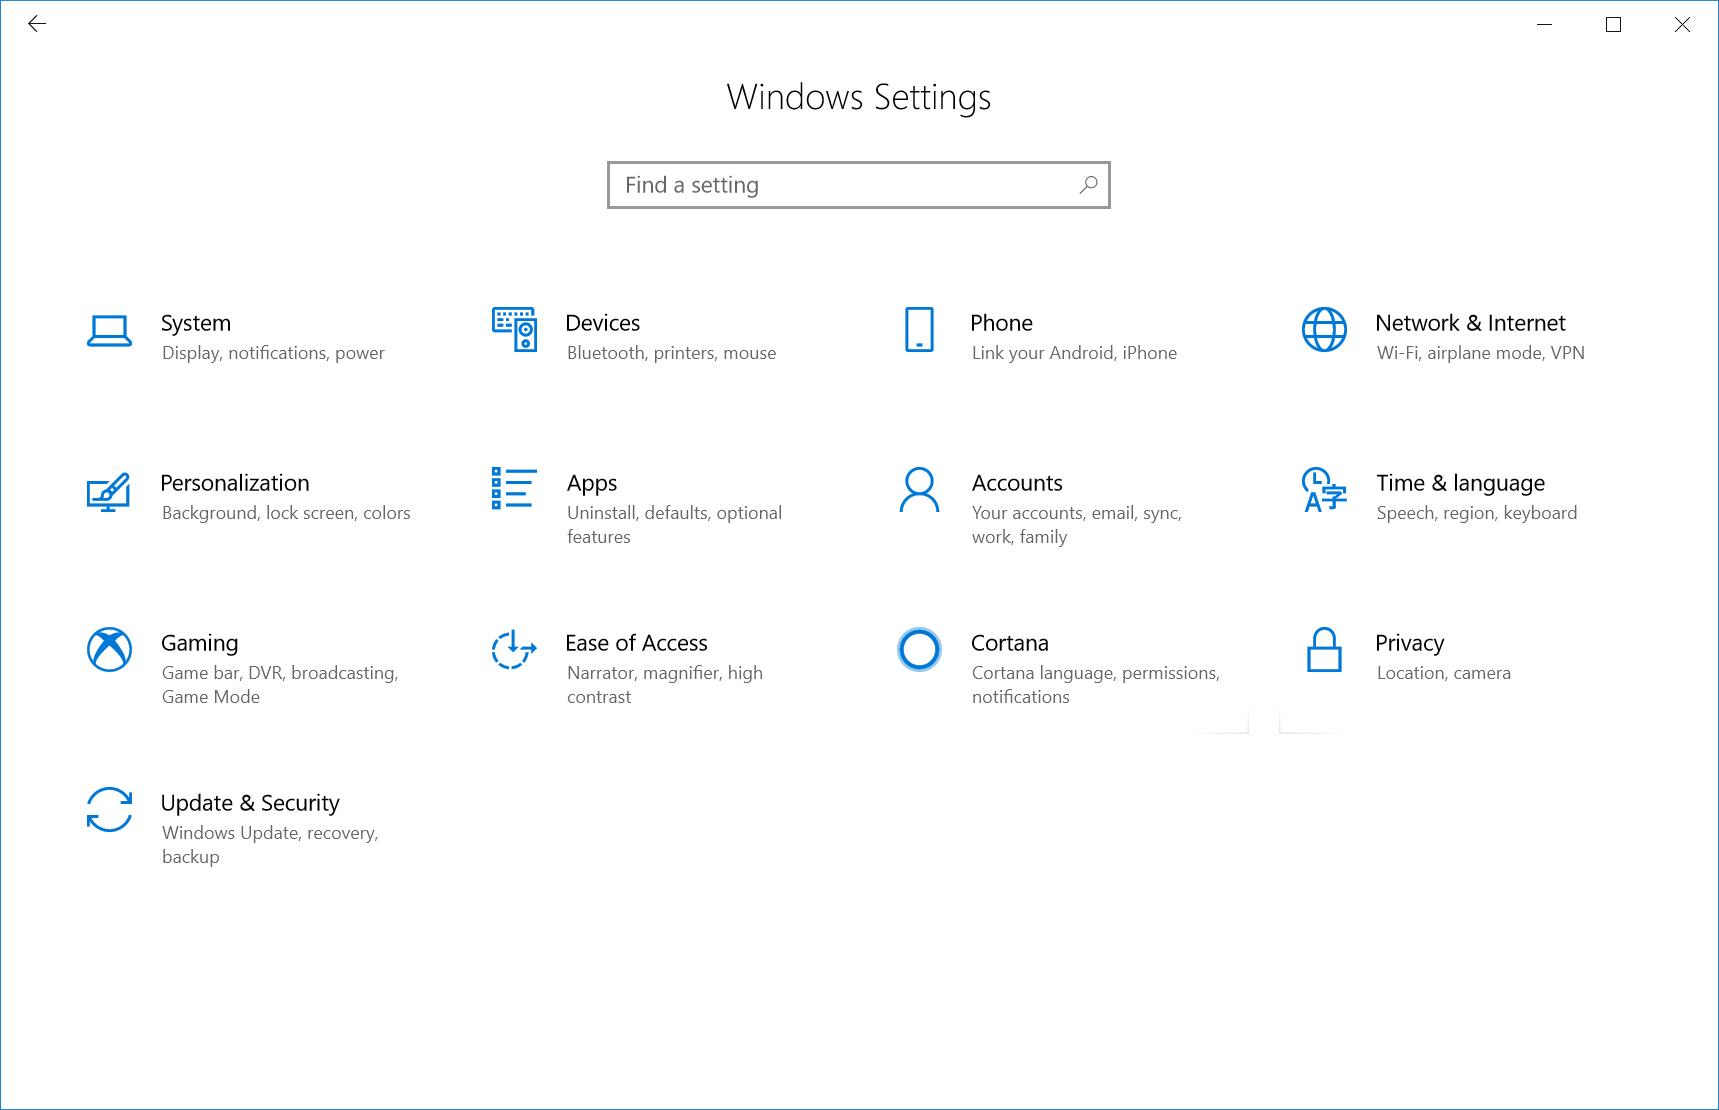 Windows Settings Fluent UI